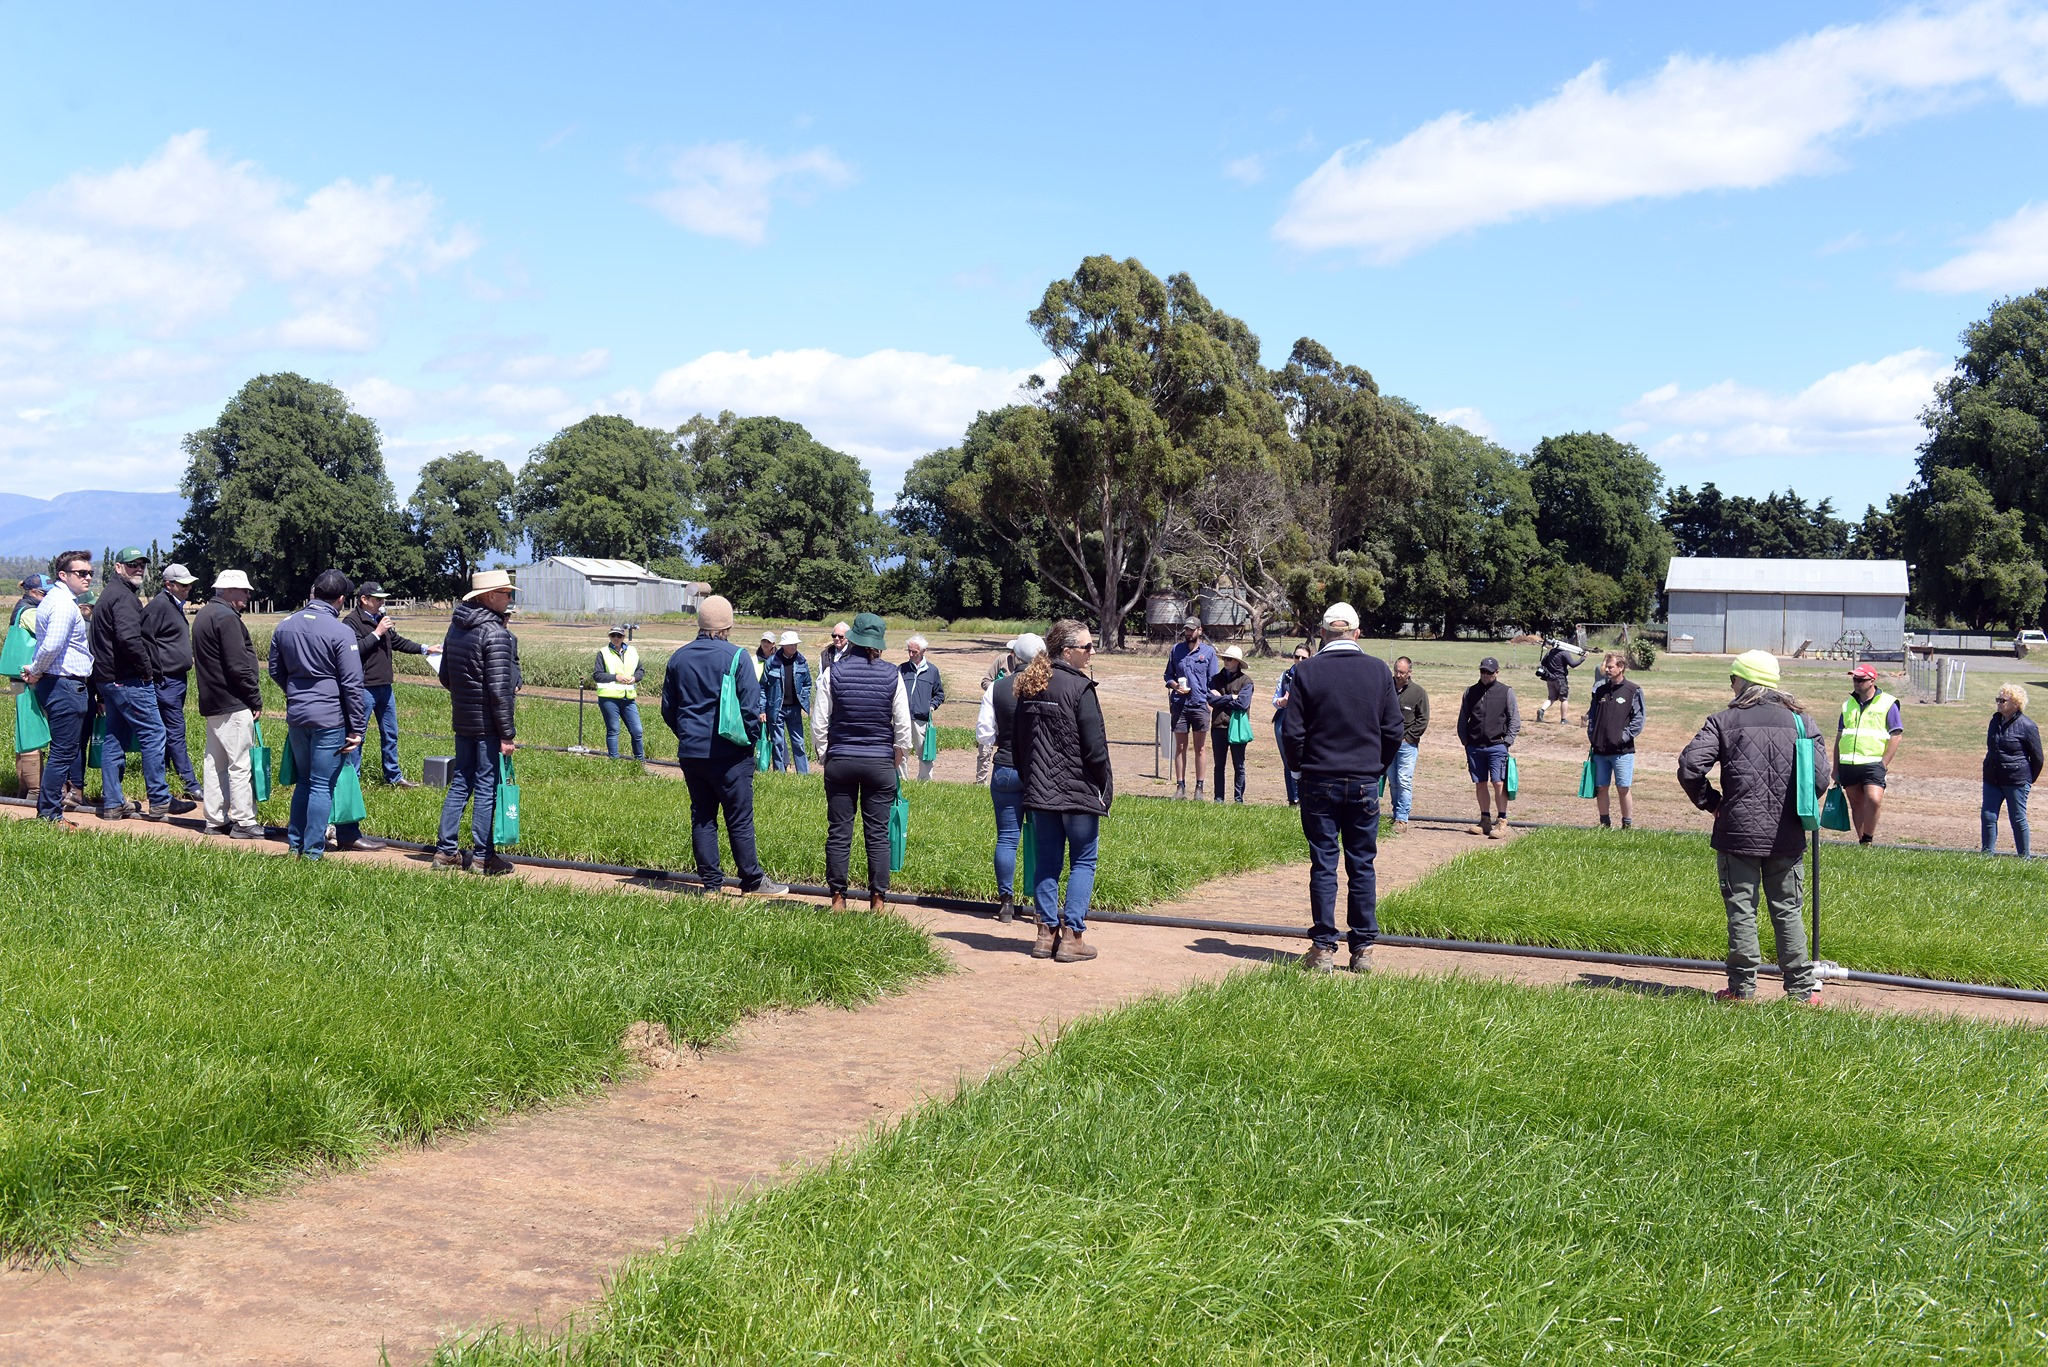 Crowd of people looking at pastures